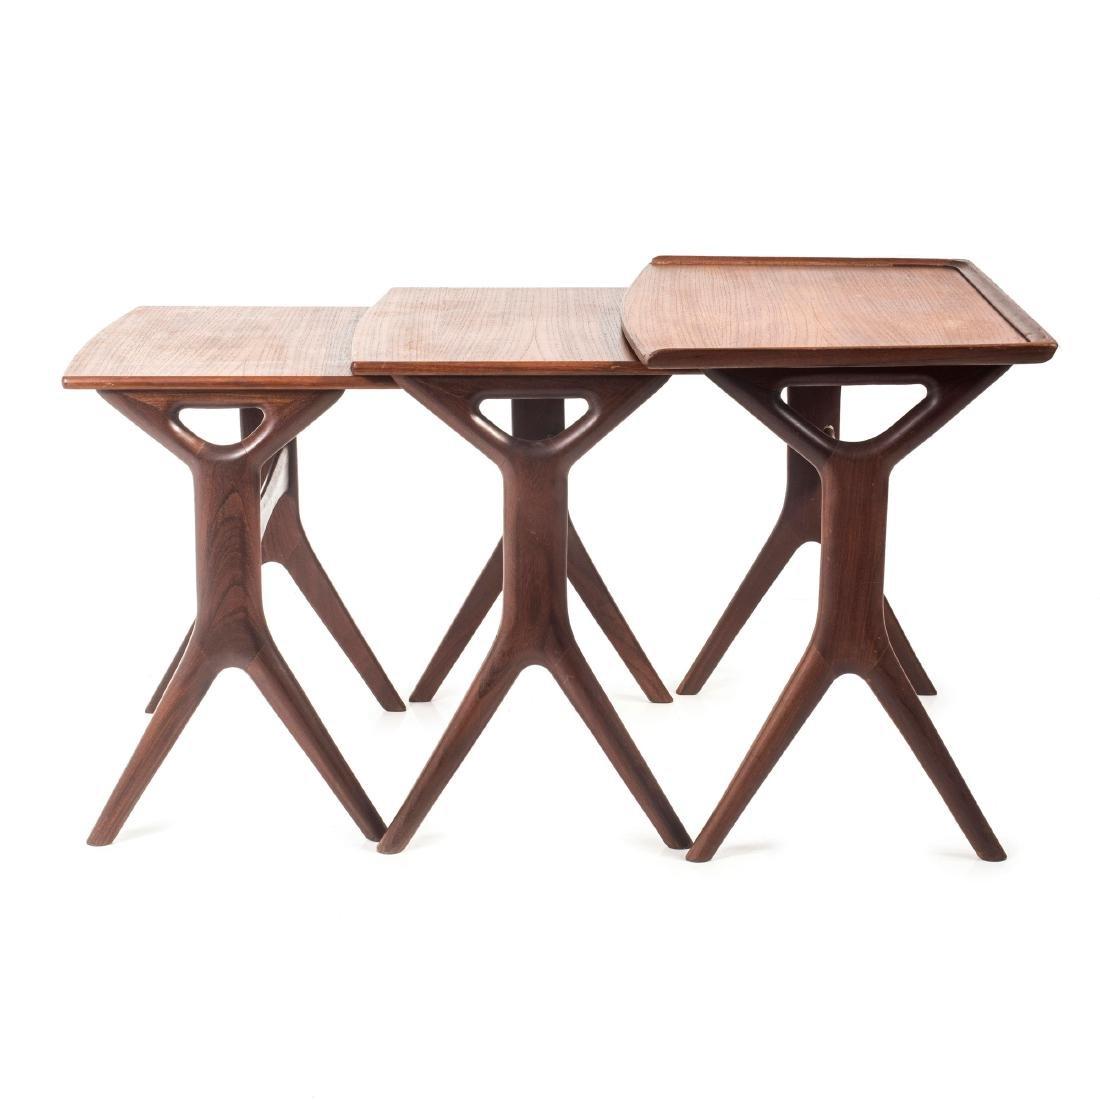 Three nesting tables, c. 1958